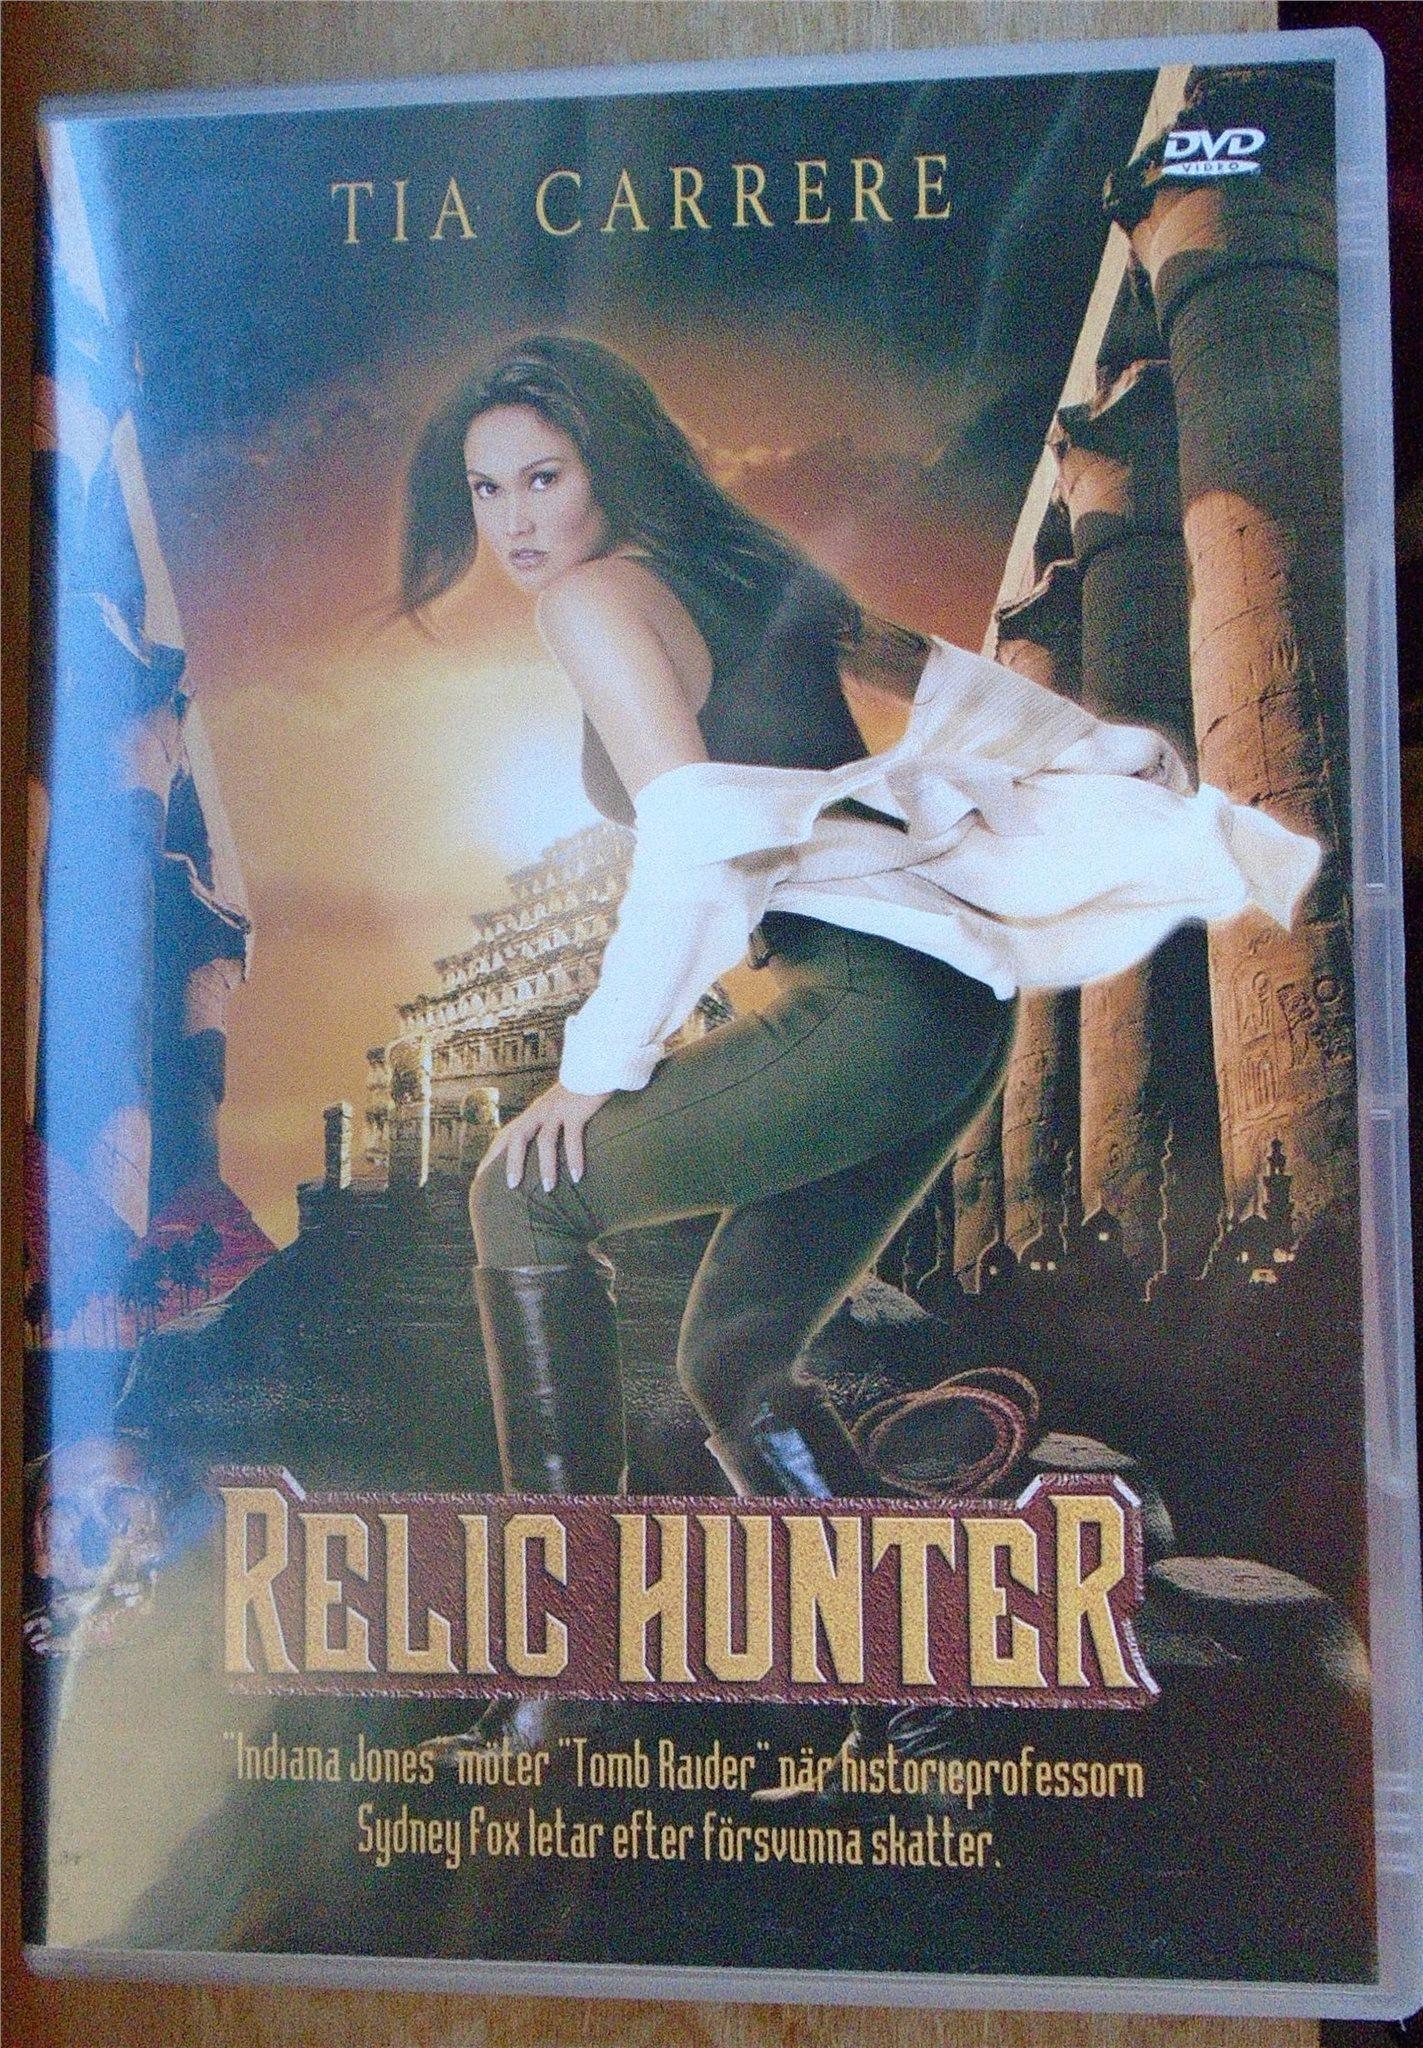 Dvd Relic Hunter Med Tia Carrere 336209284 ᐈ Kop Pa Tradera